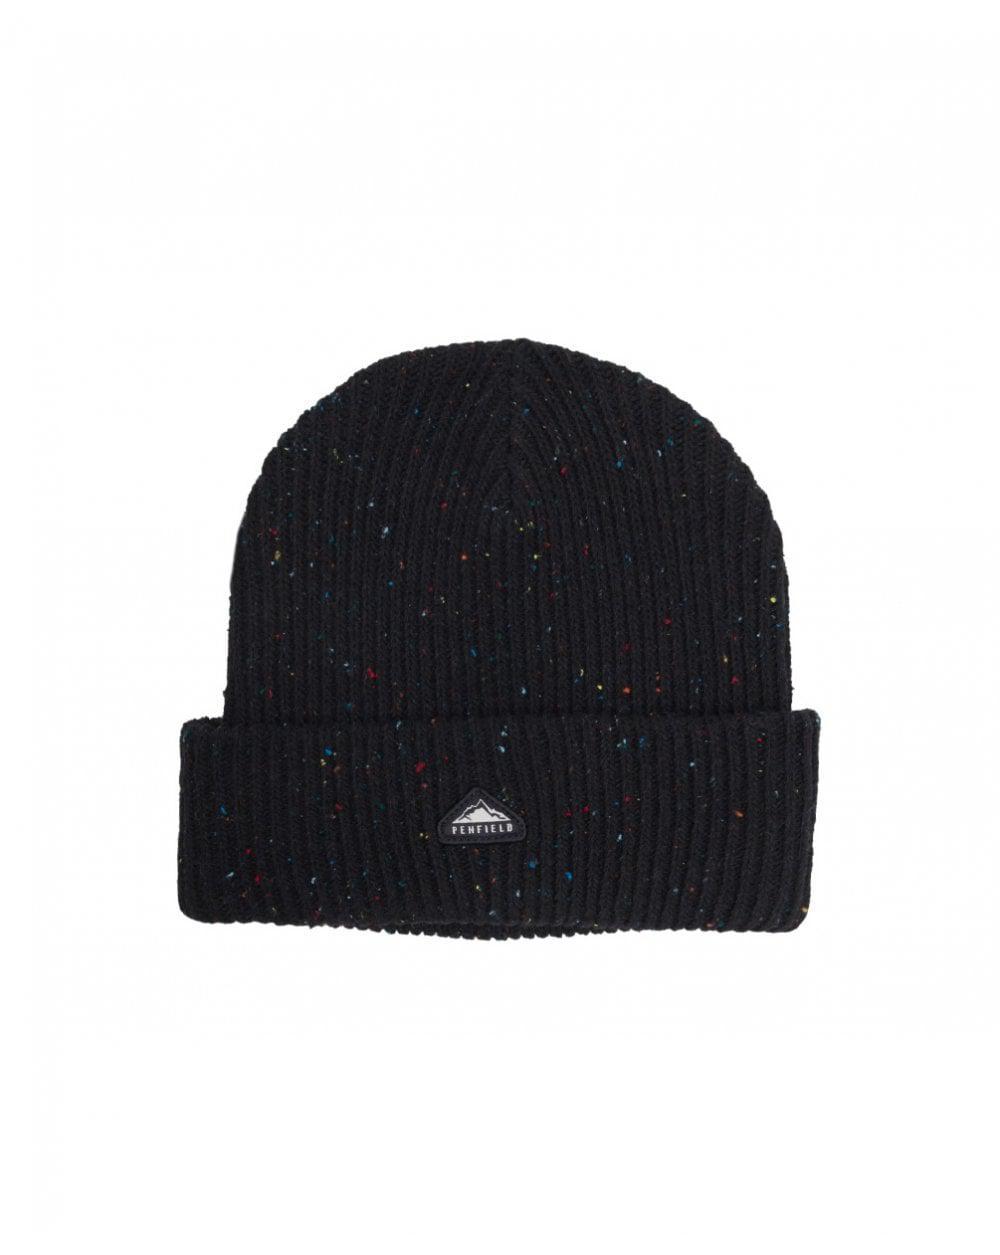 44928d959 Penfield - Black Harris Fleck Beanie Hat for Men - Lyst. View fullscreen